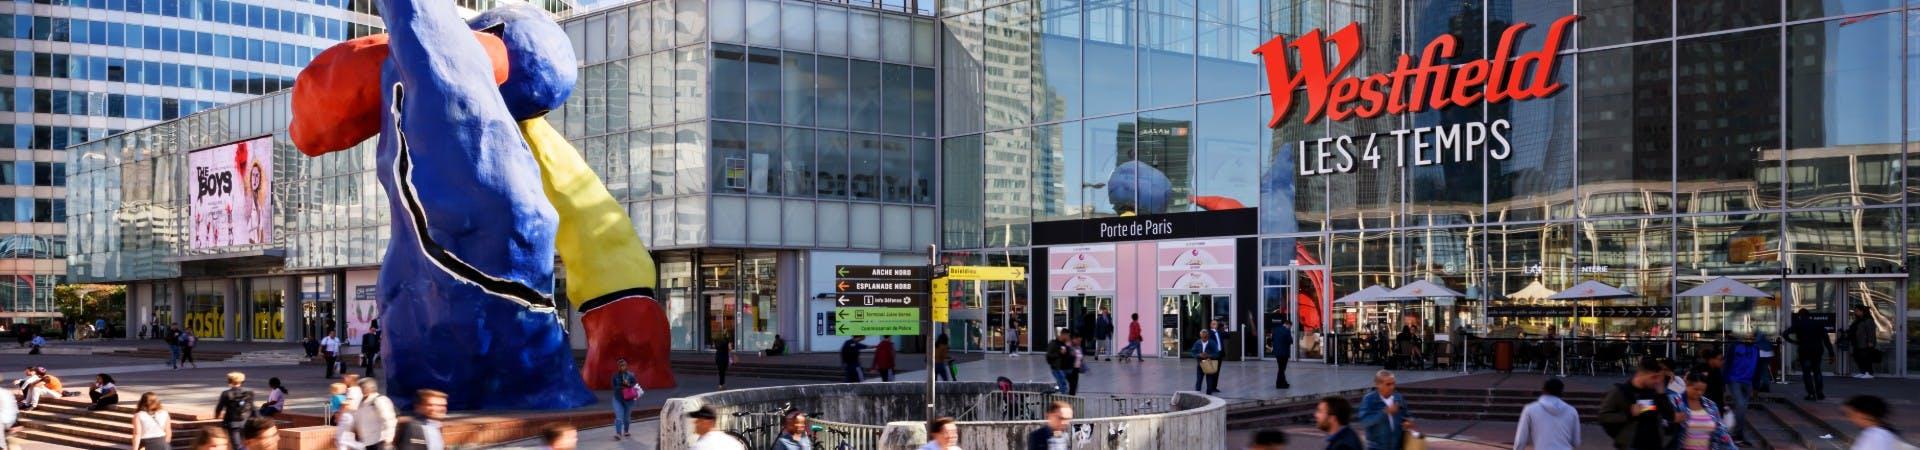 Popup store en centre commercial Unibail-Rodamco-Westfield